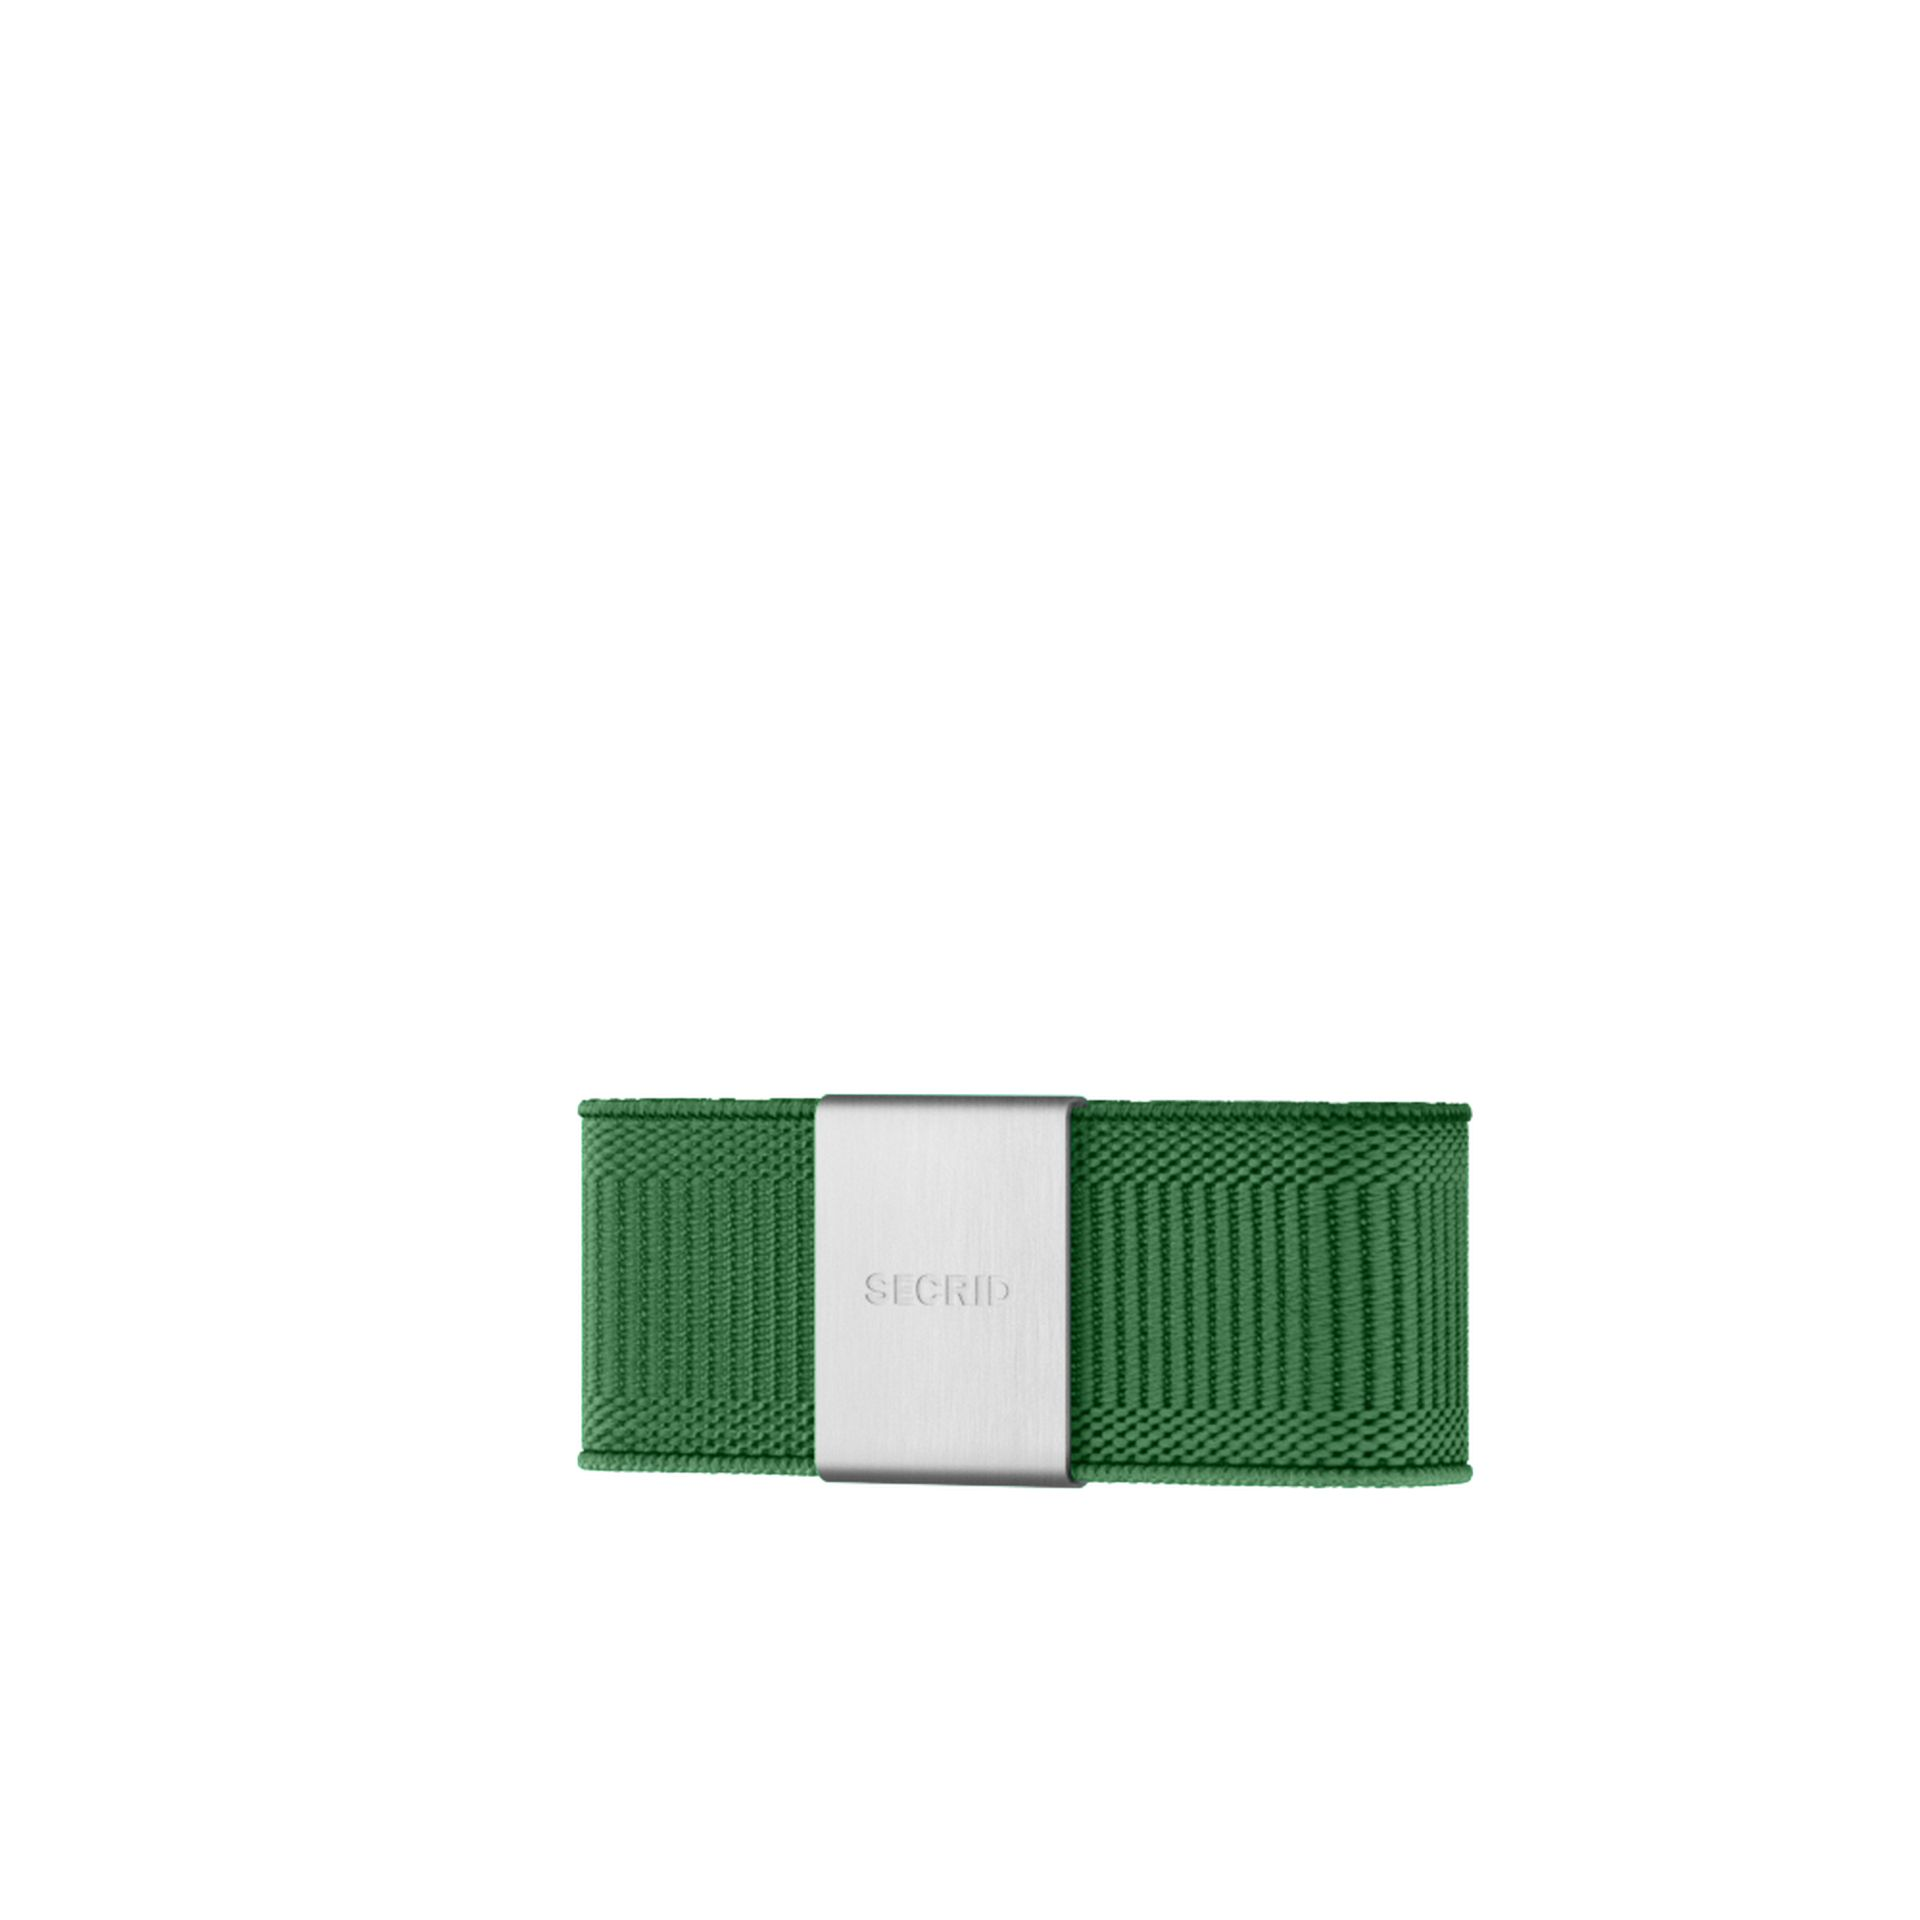 Secrid Moneyband Green